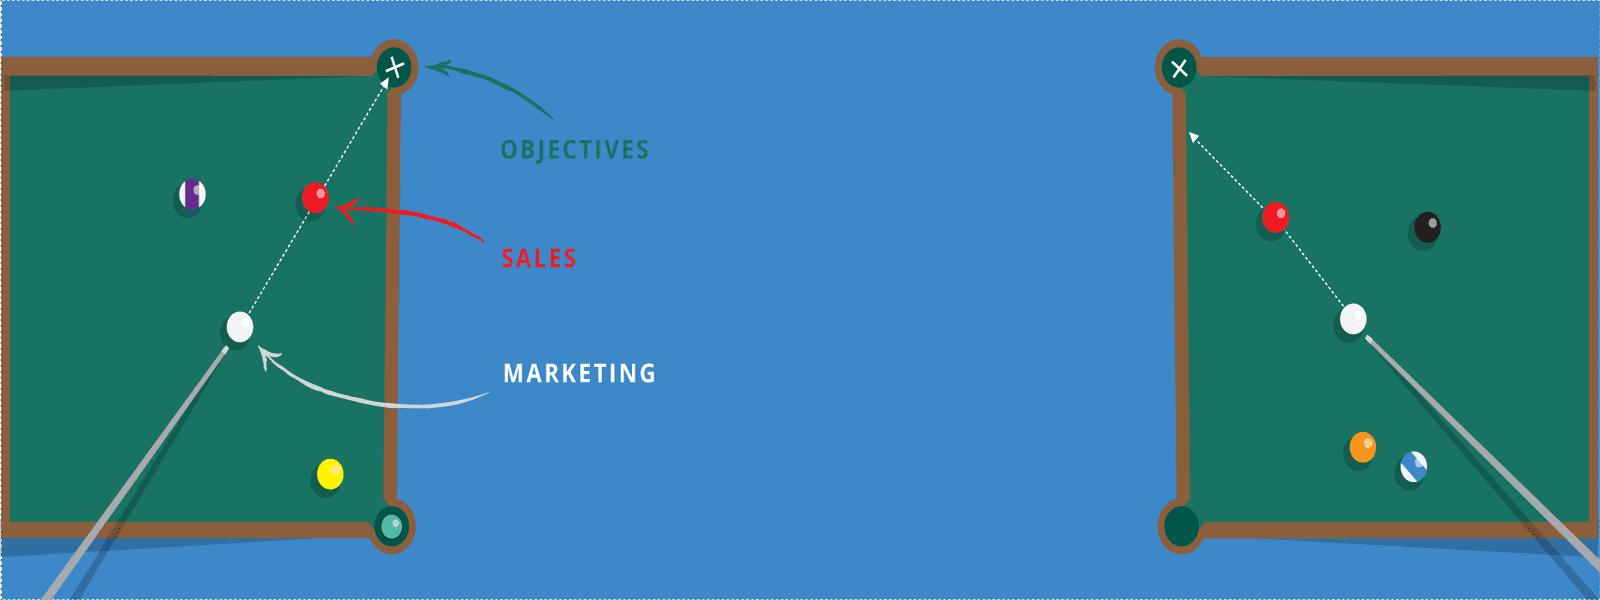 Improving Sales Marketing Alignment